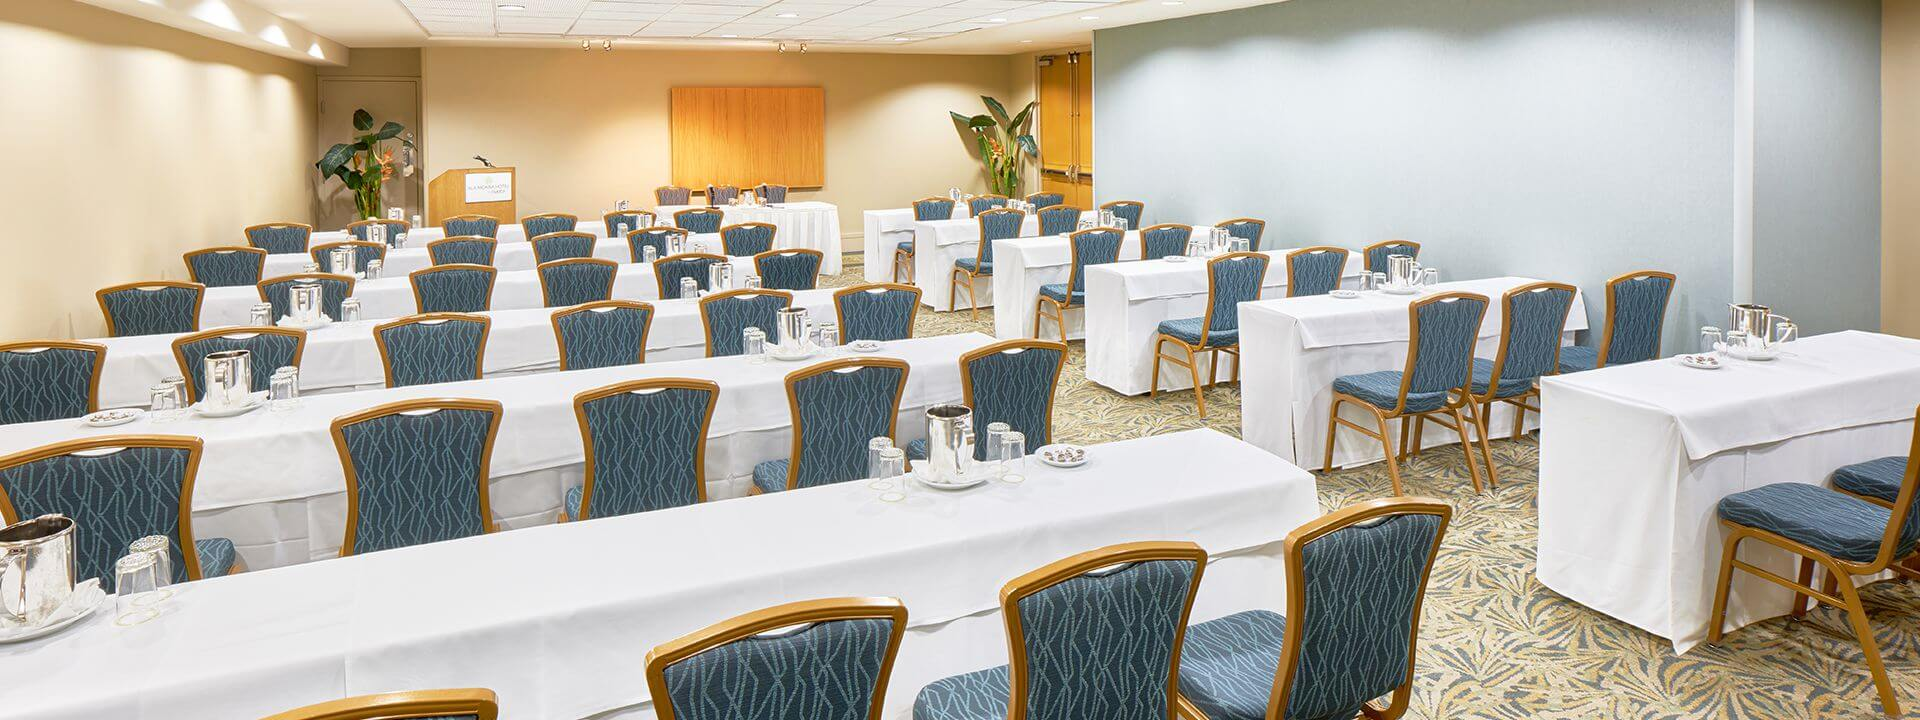 Ala Moana Hotel Events Venues Rooms Carnation